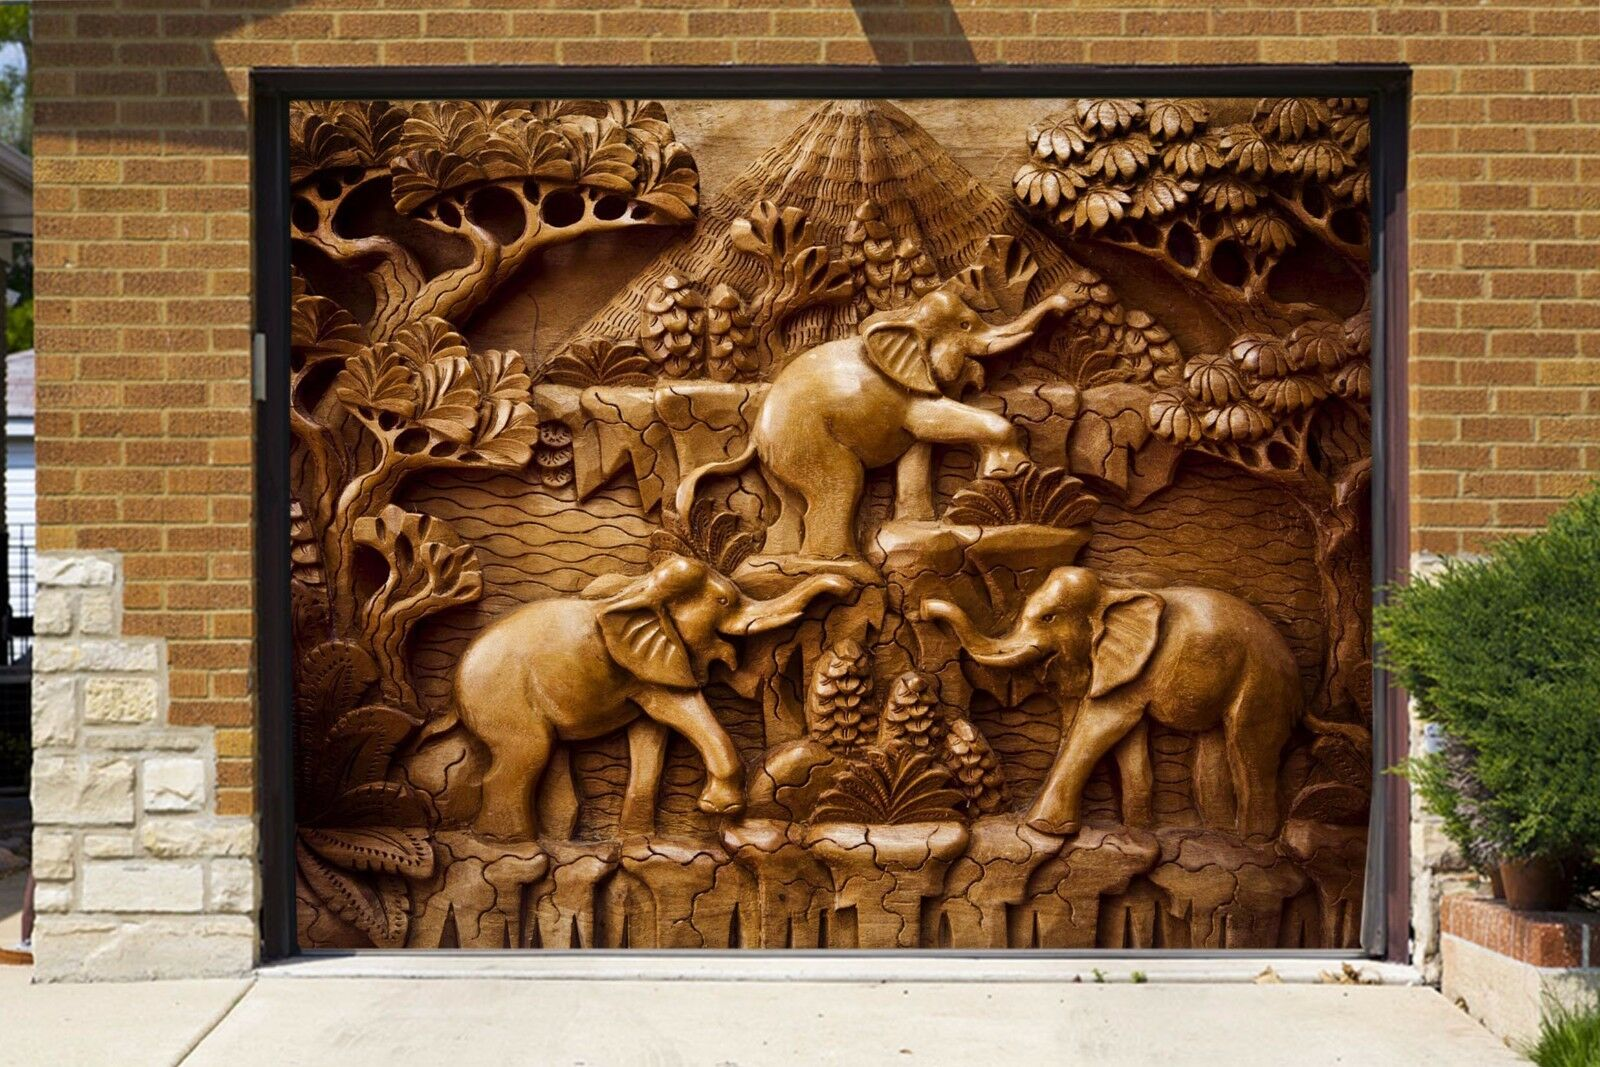 3D Sculpture 97 Garage Door Murals Wall Print Decal Wall AJ WALLPAPER AU Carly